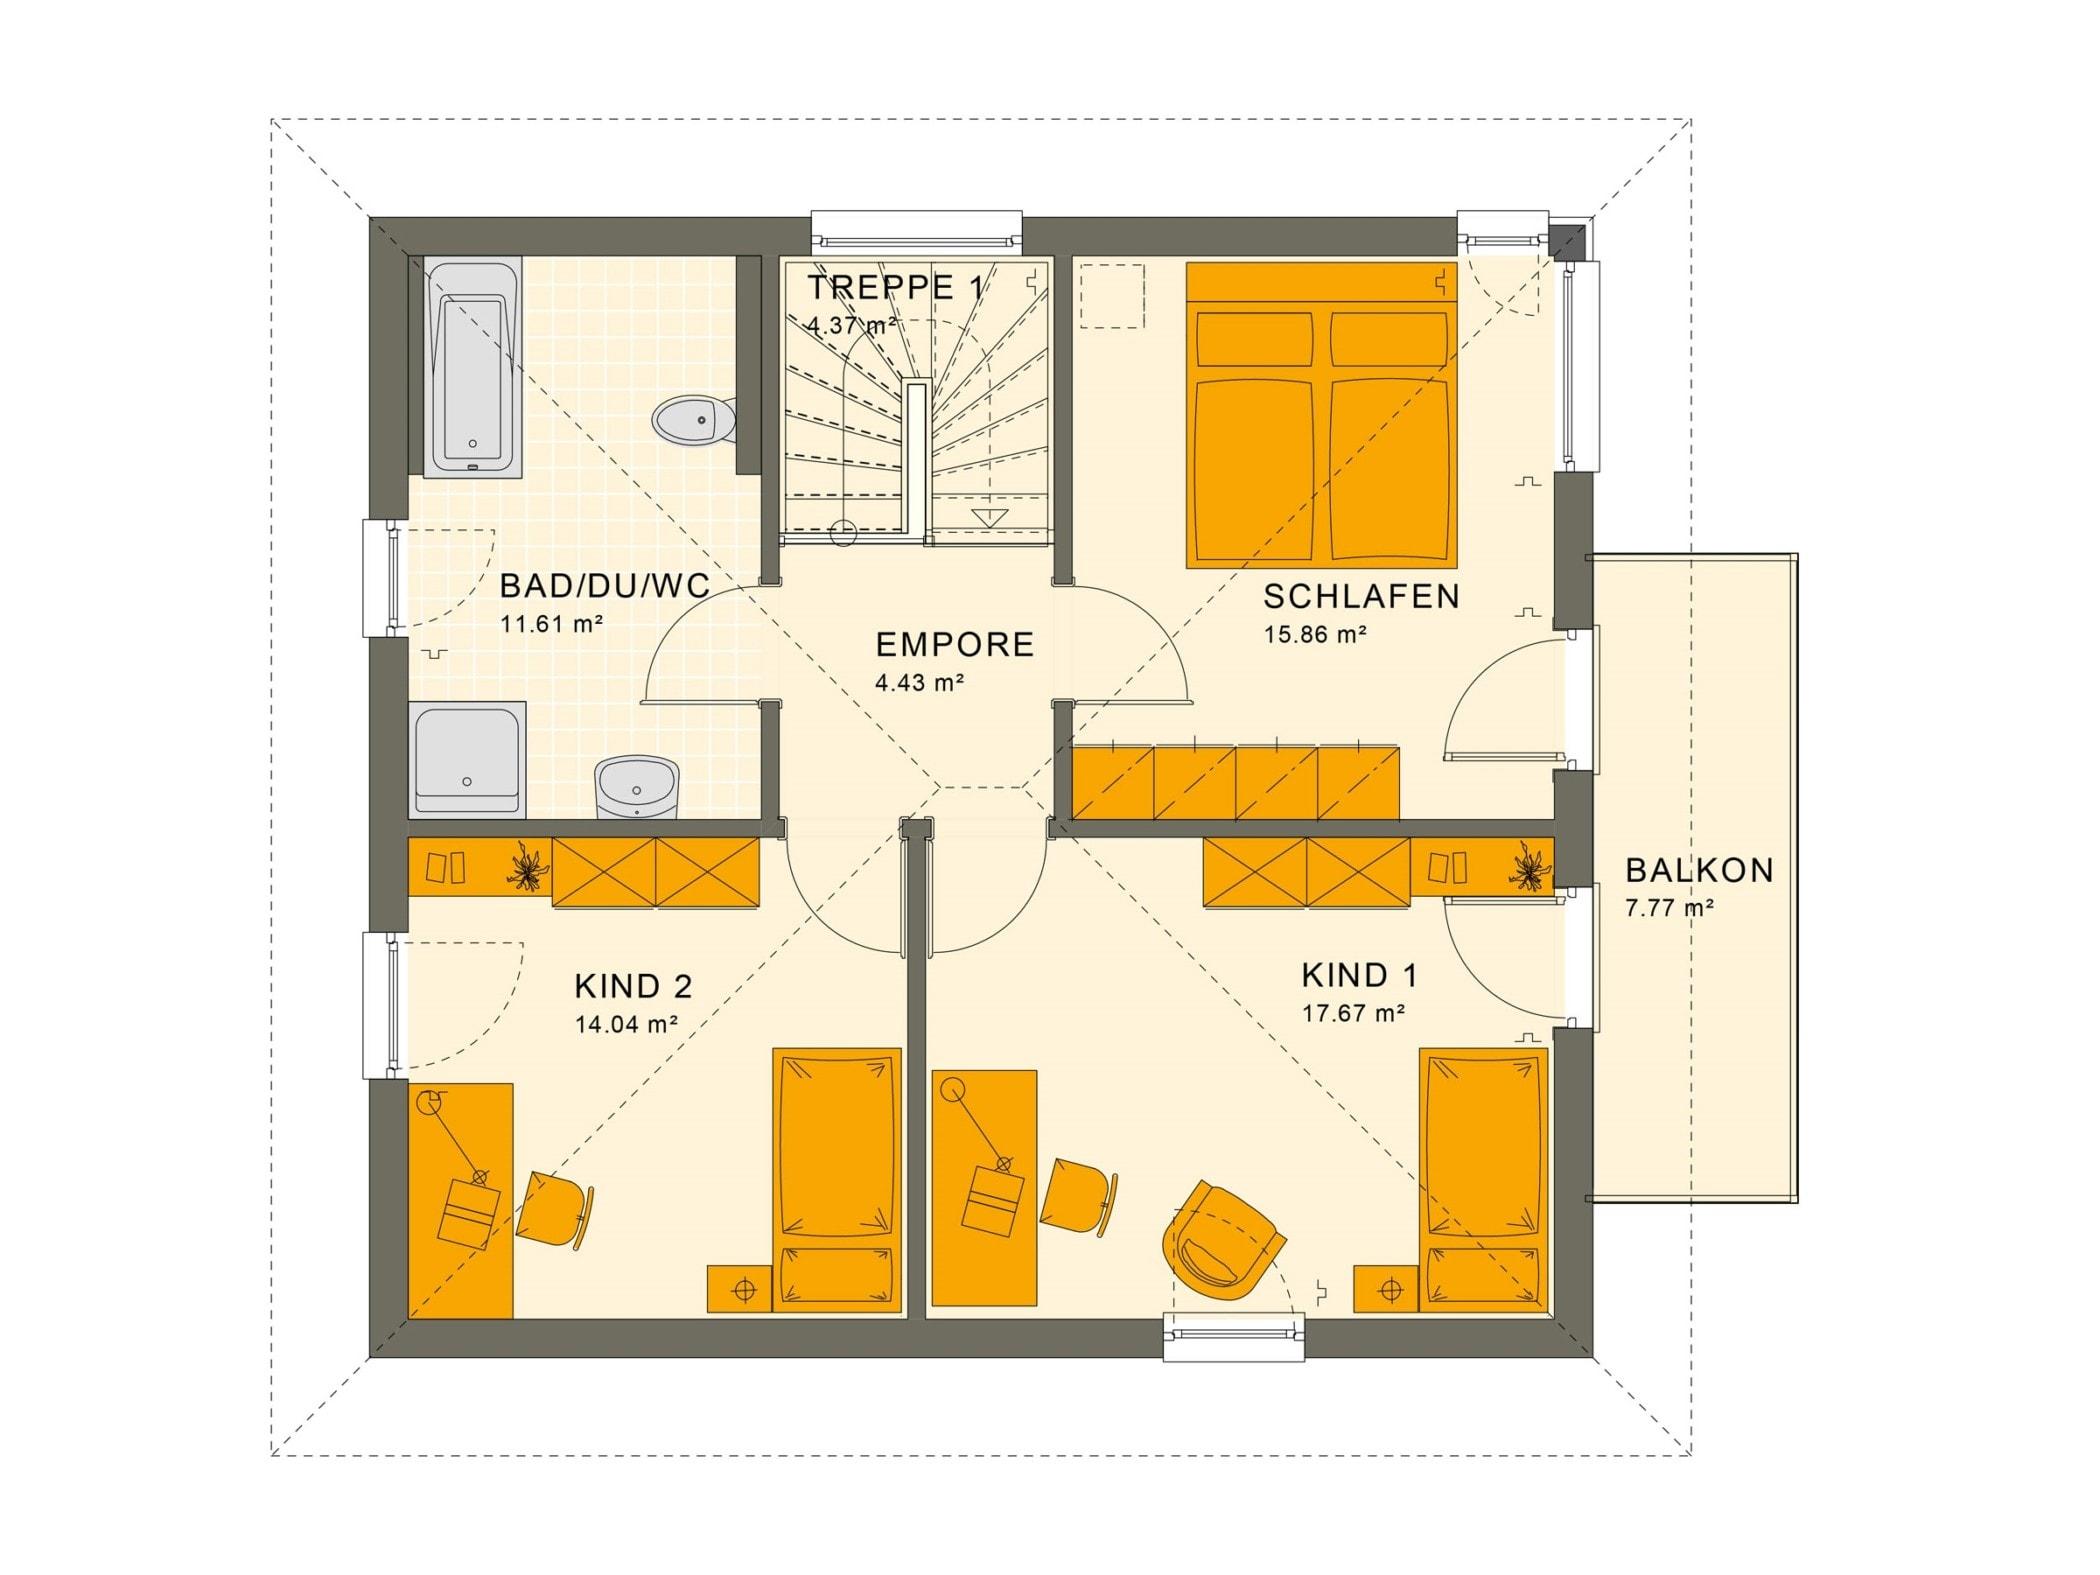 Fertighaus Stadtvilla Grundriss mit Walmdach & Balkon, 5 Zimmer, 135 qm - Living Haus SUNSHINE 136 V7 - HausbauDirekt.de